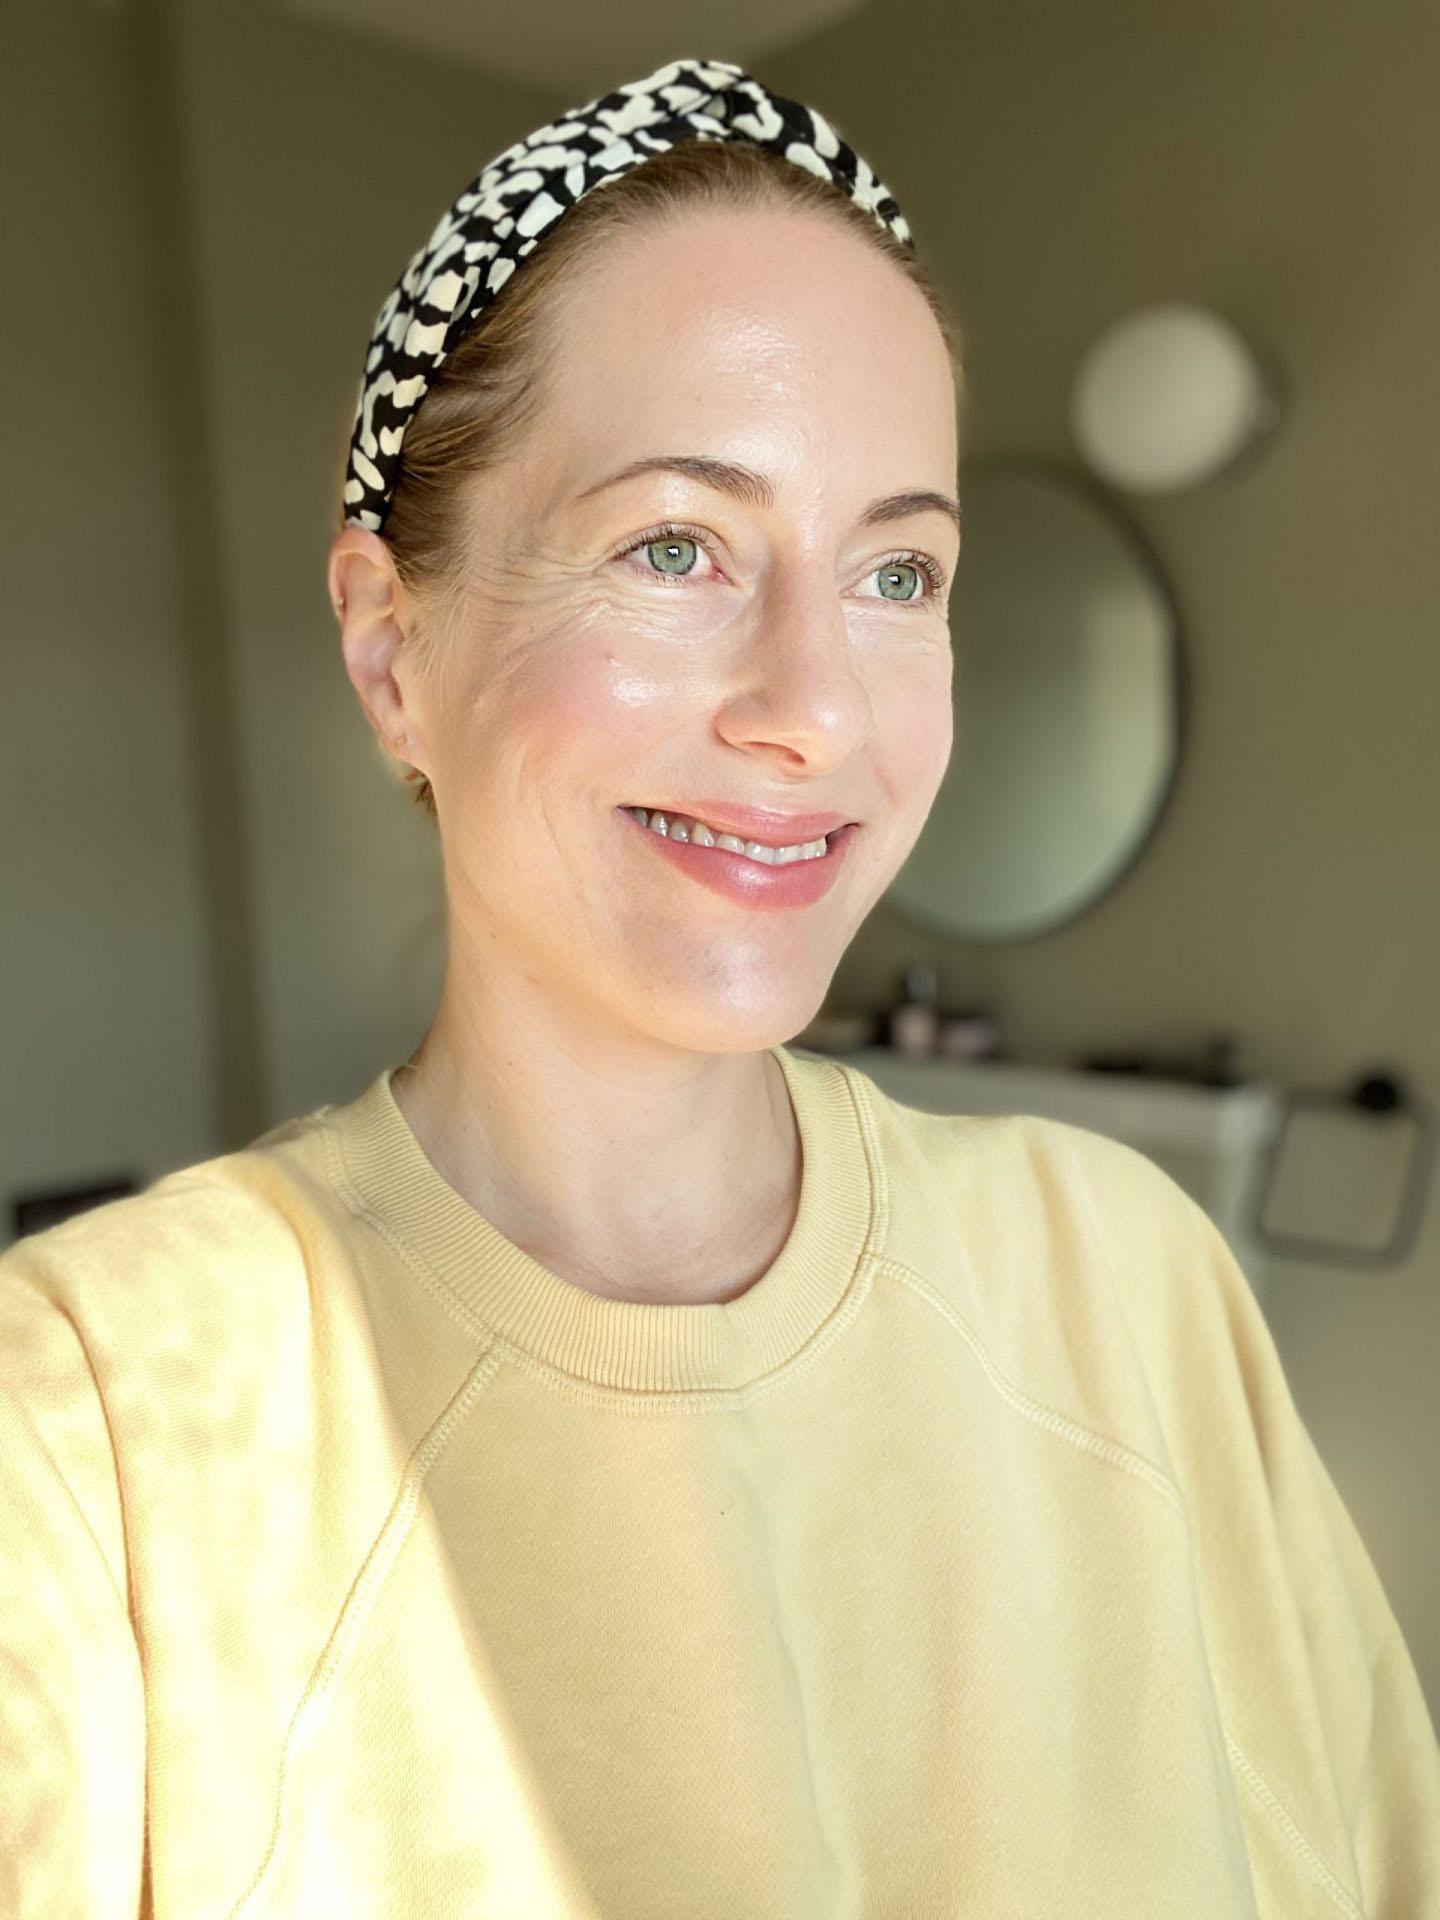 Schönen guten Morgen! So geht mein Early Bird Make-up feat. NUI Cosmetics